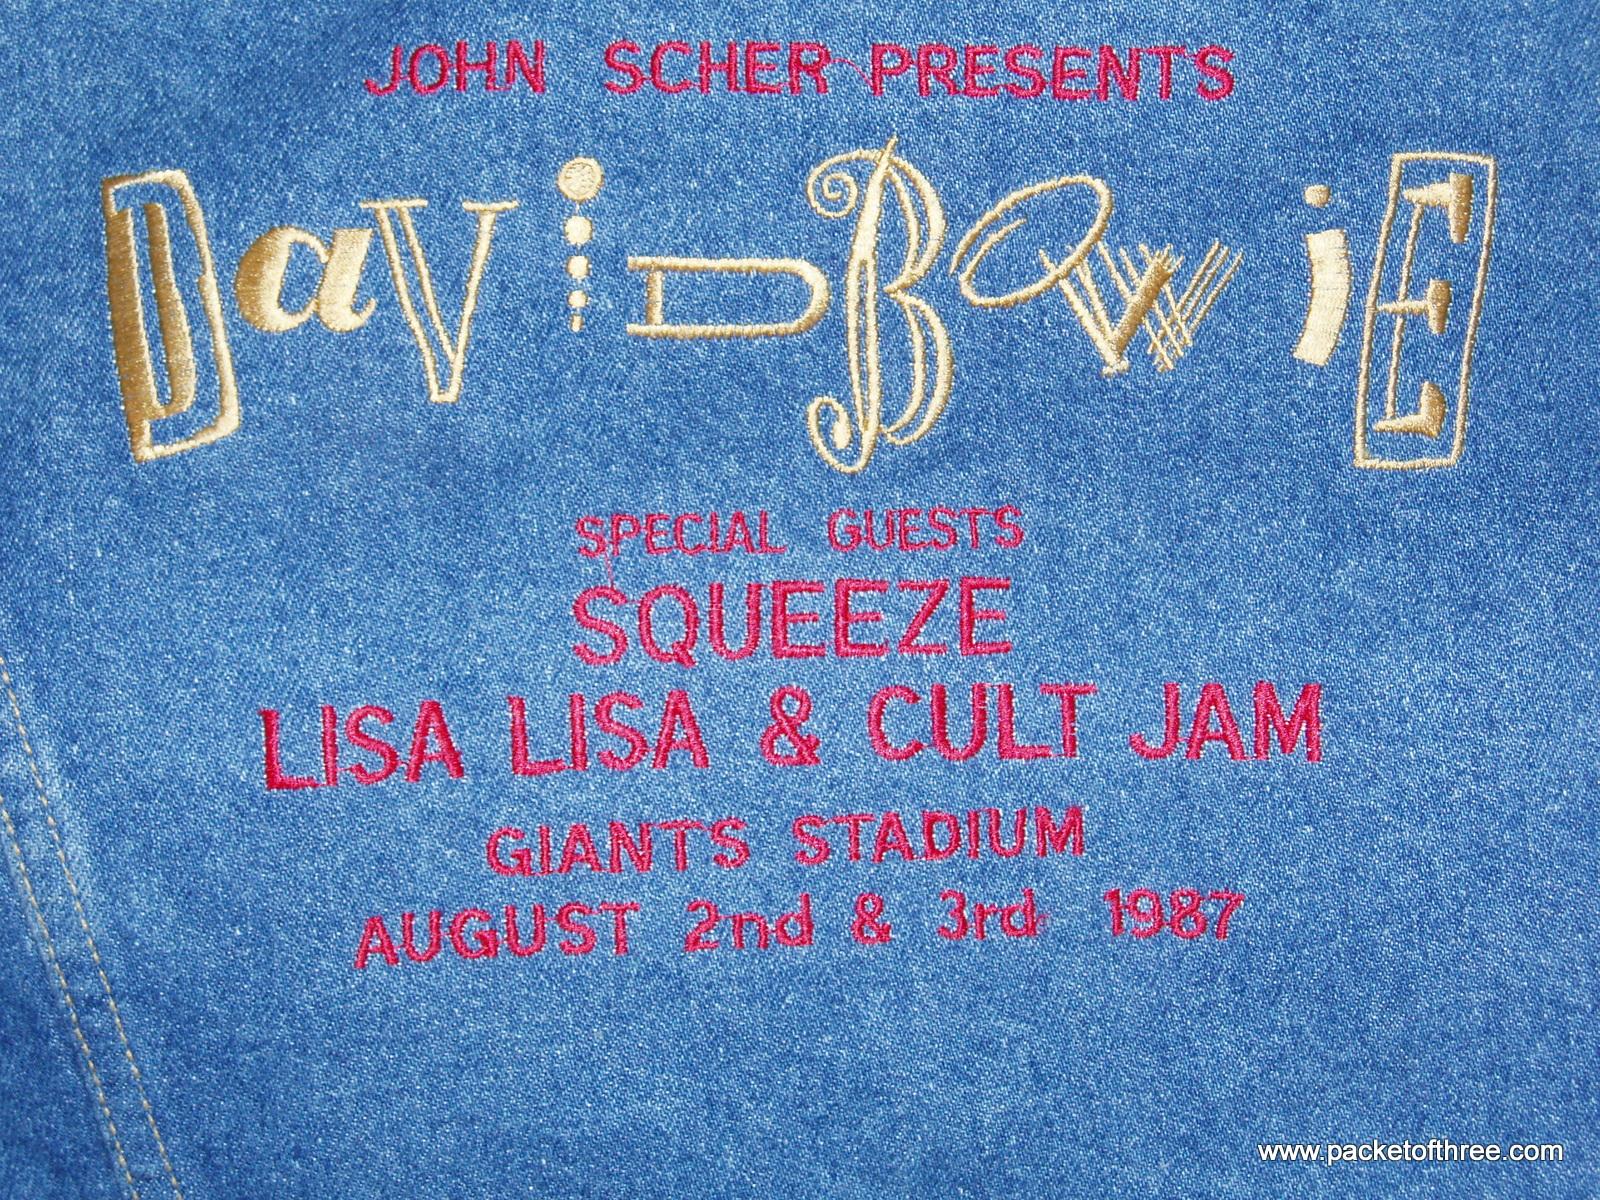 Glenn's Tour Jacket - August 1987